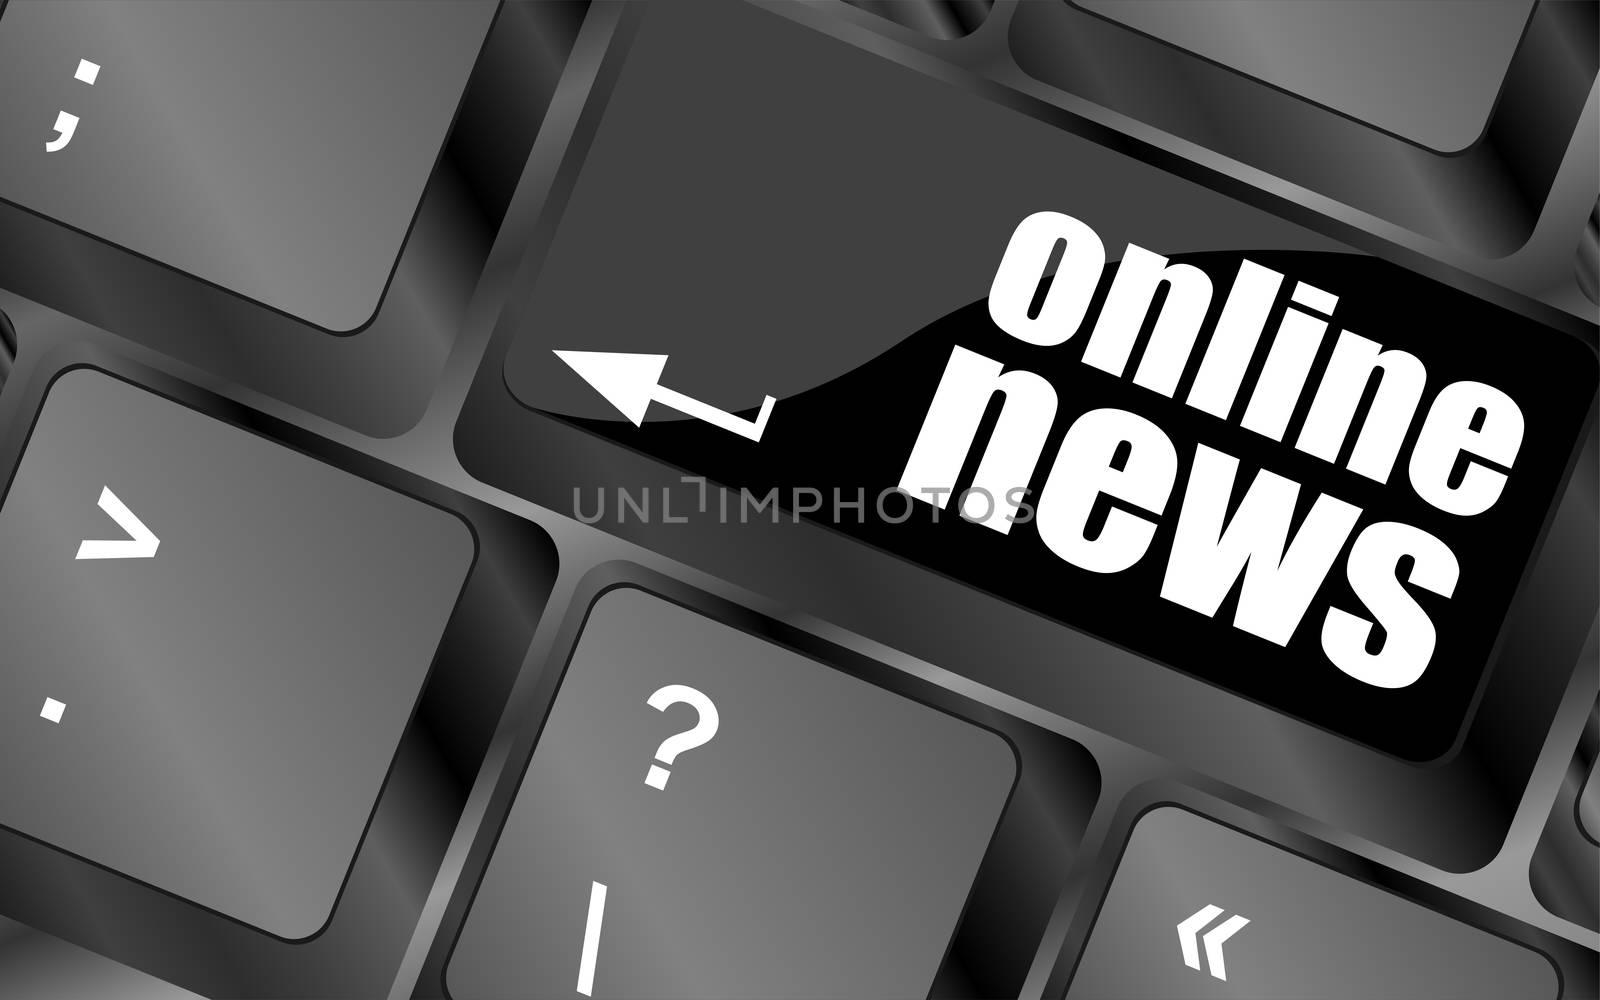 online news button on computer keyboard key